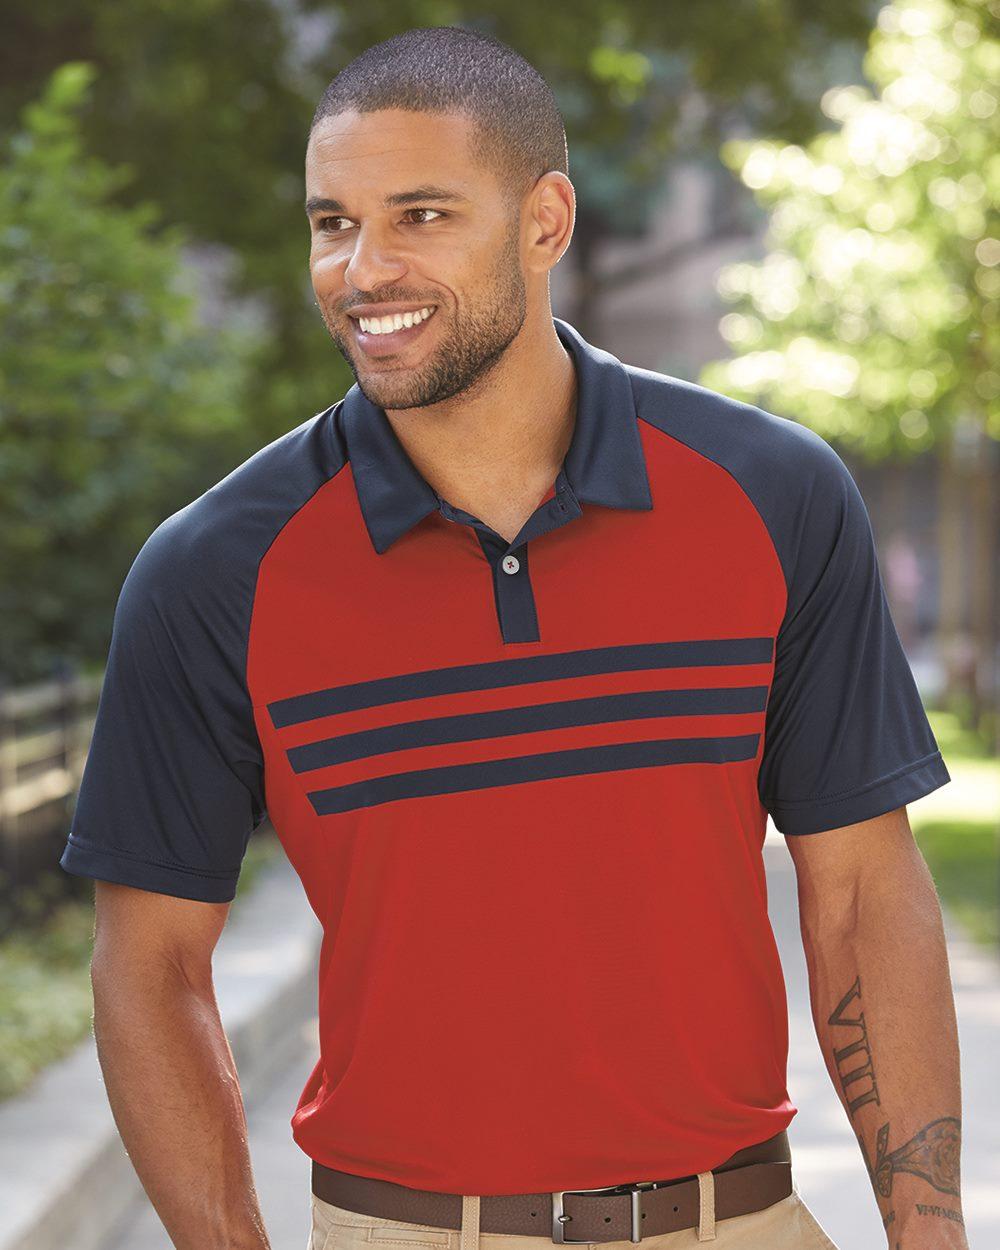 Adidas A224 - Climacool 3-Stripes Sport Shirt